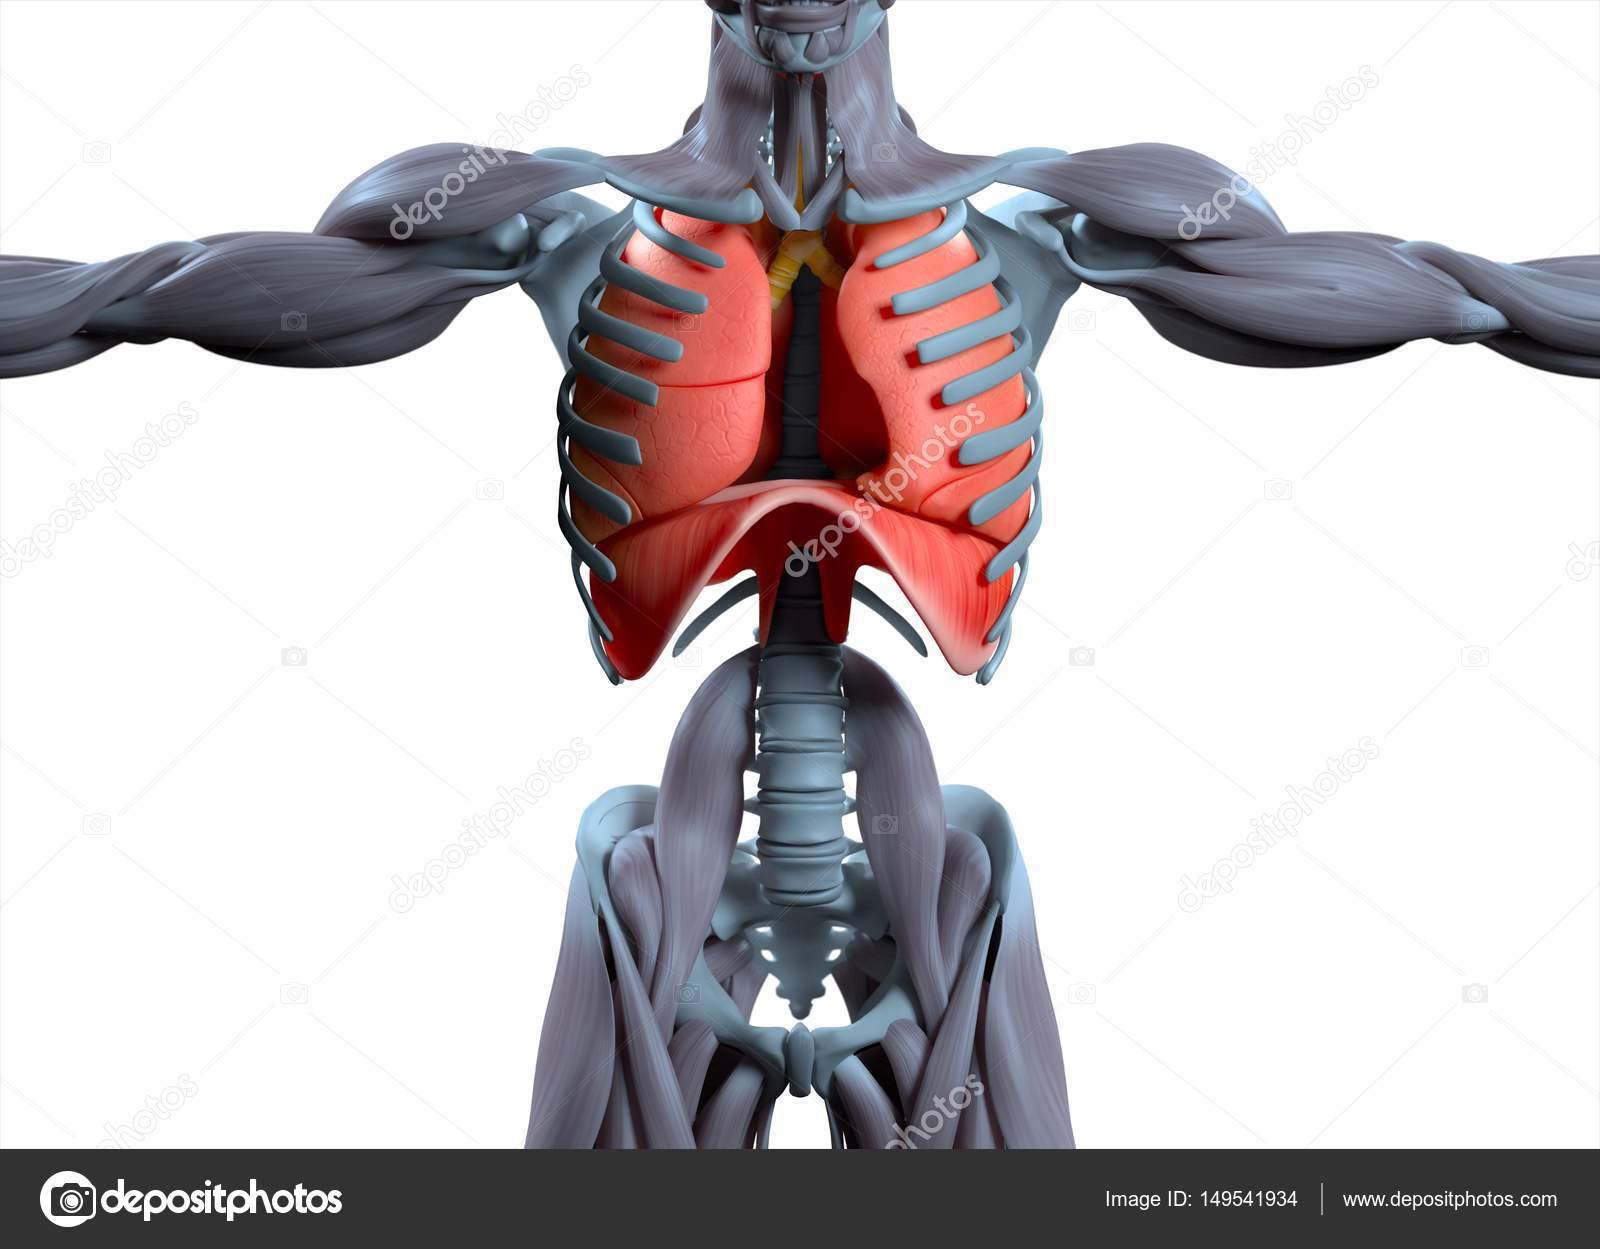 human lungs anatomy model — Stock Photo © AnatomyInsider #149541934